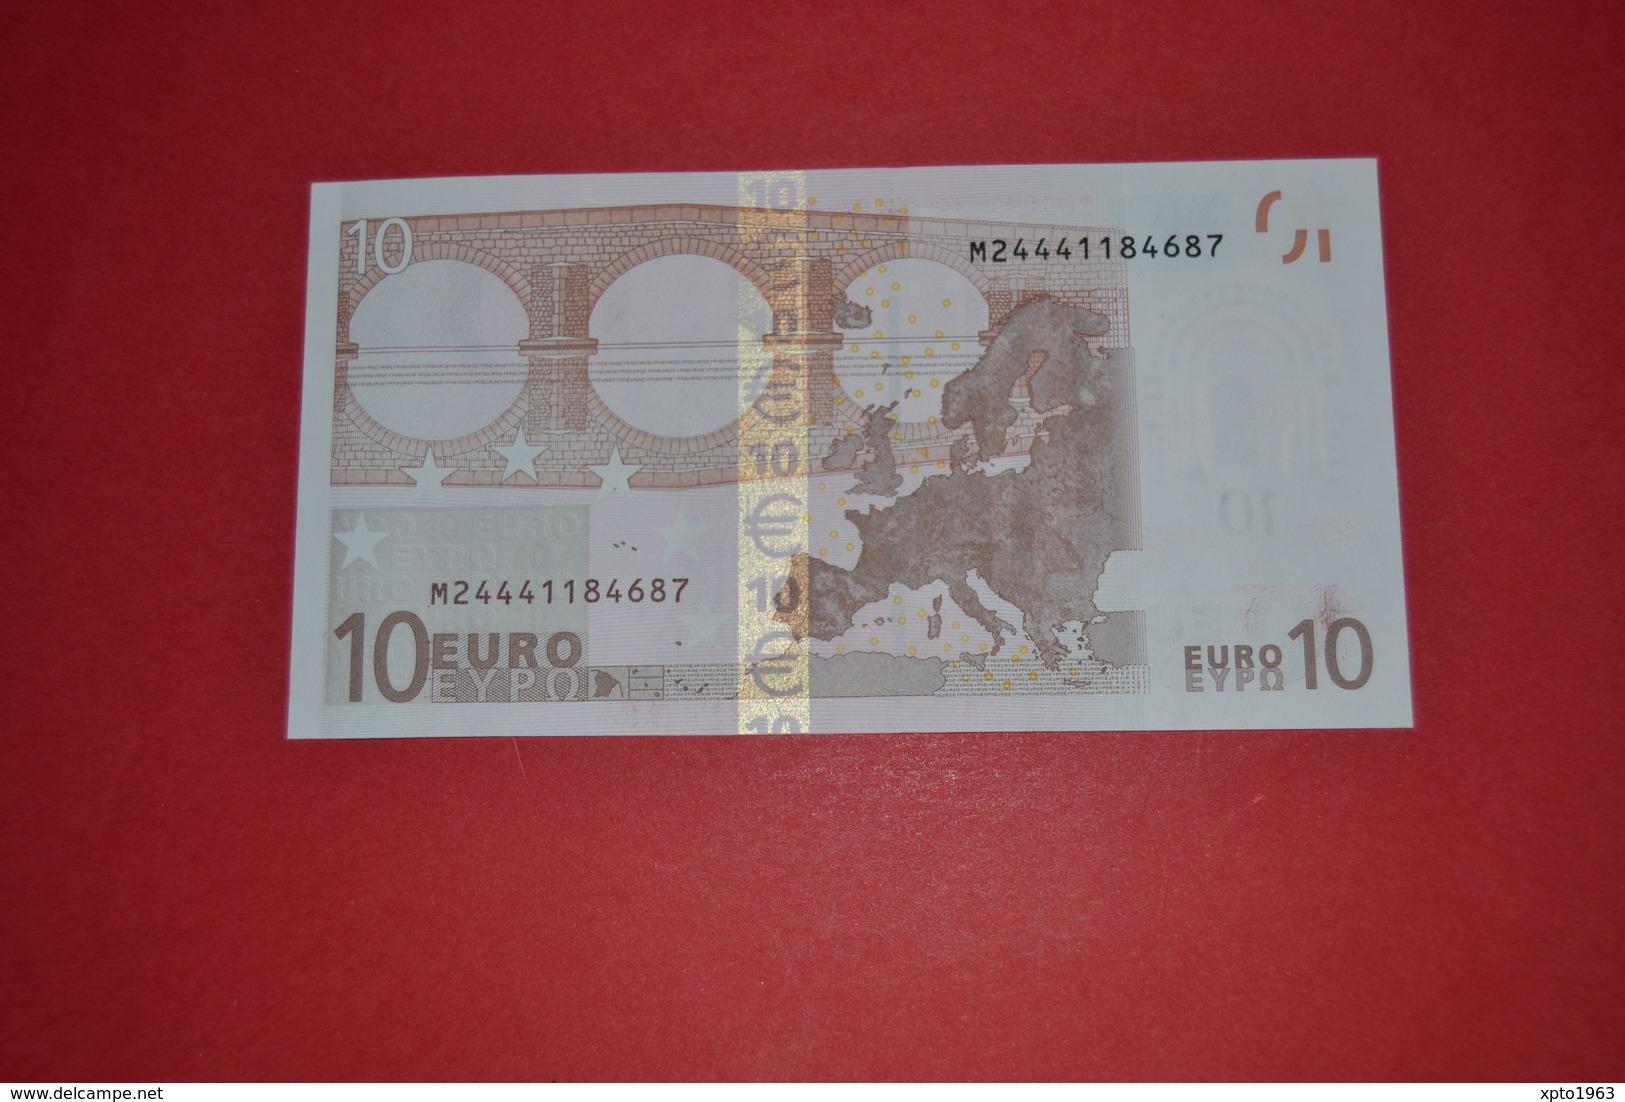 10 EURO PORTUGAL U007B3 - Serial Number  M24441184687 - Perfect UNC - EURO